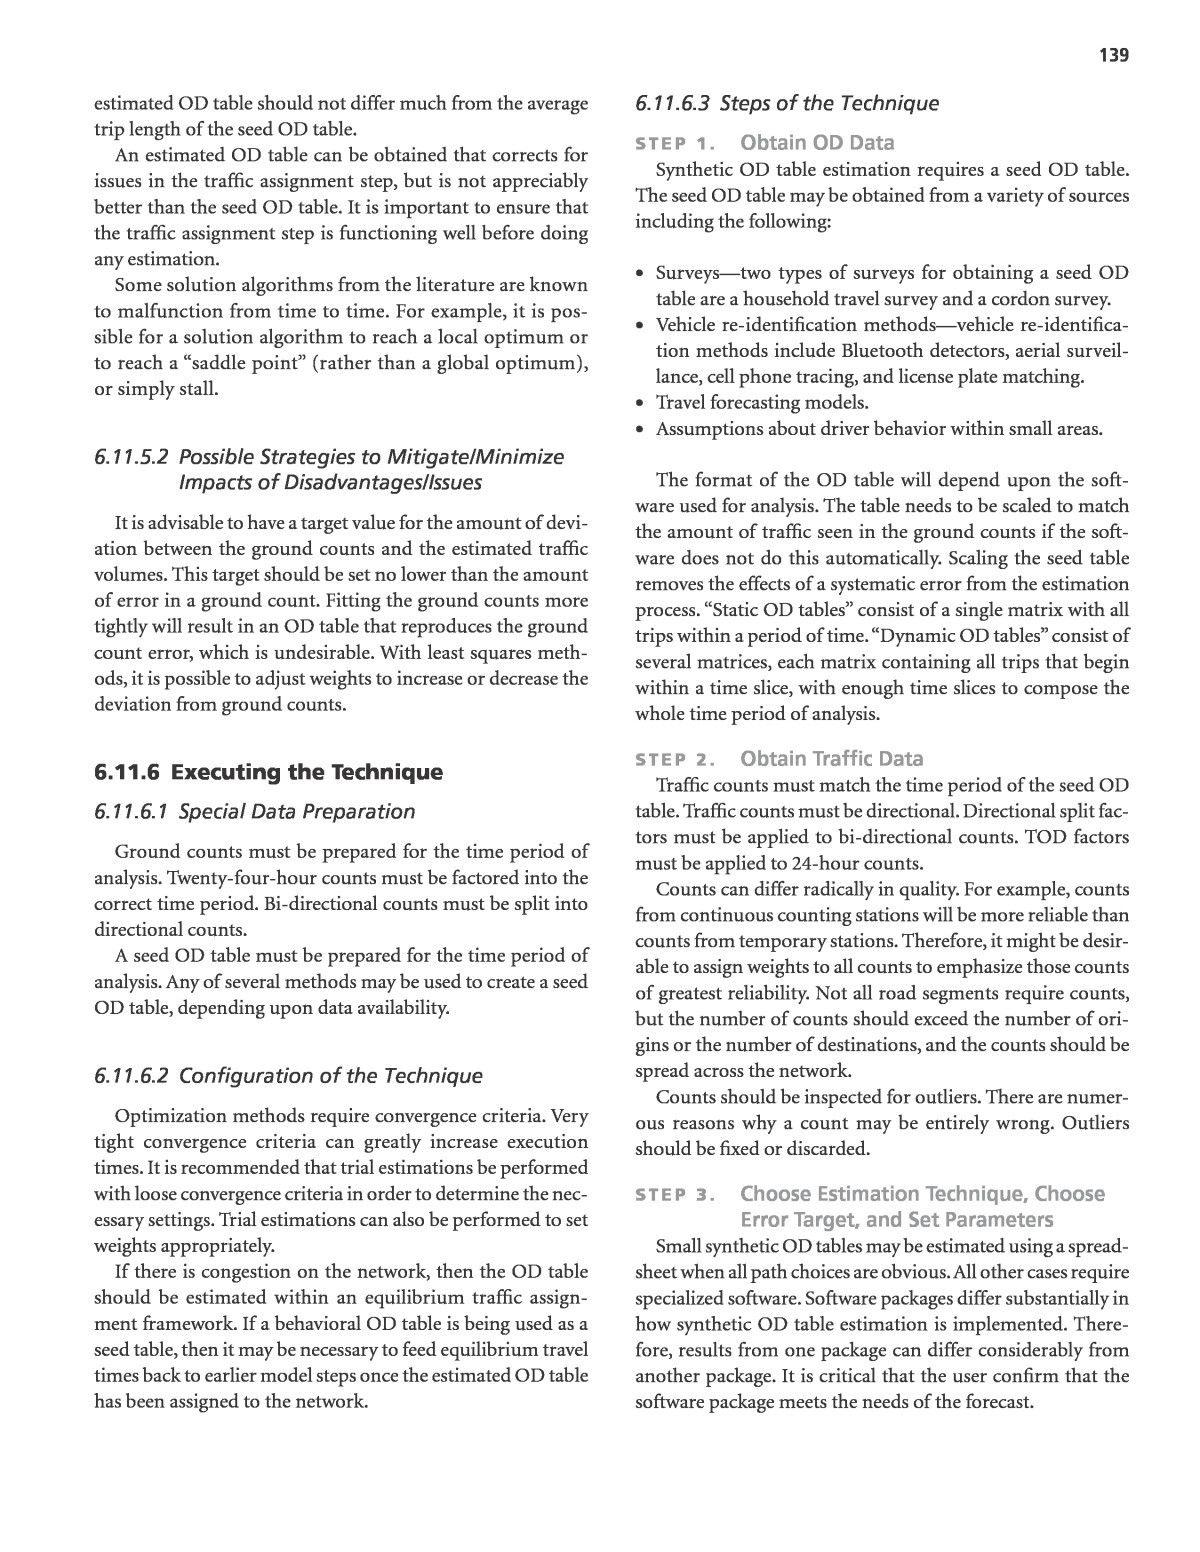 Civil War Causes Worksheet Answer Key